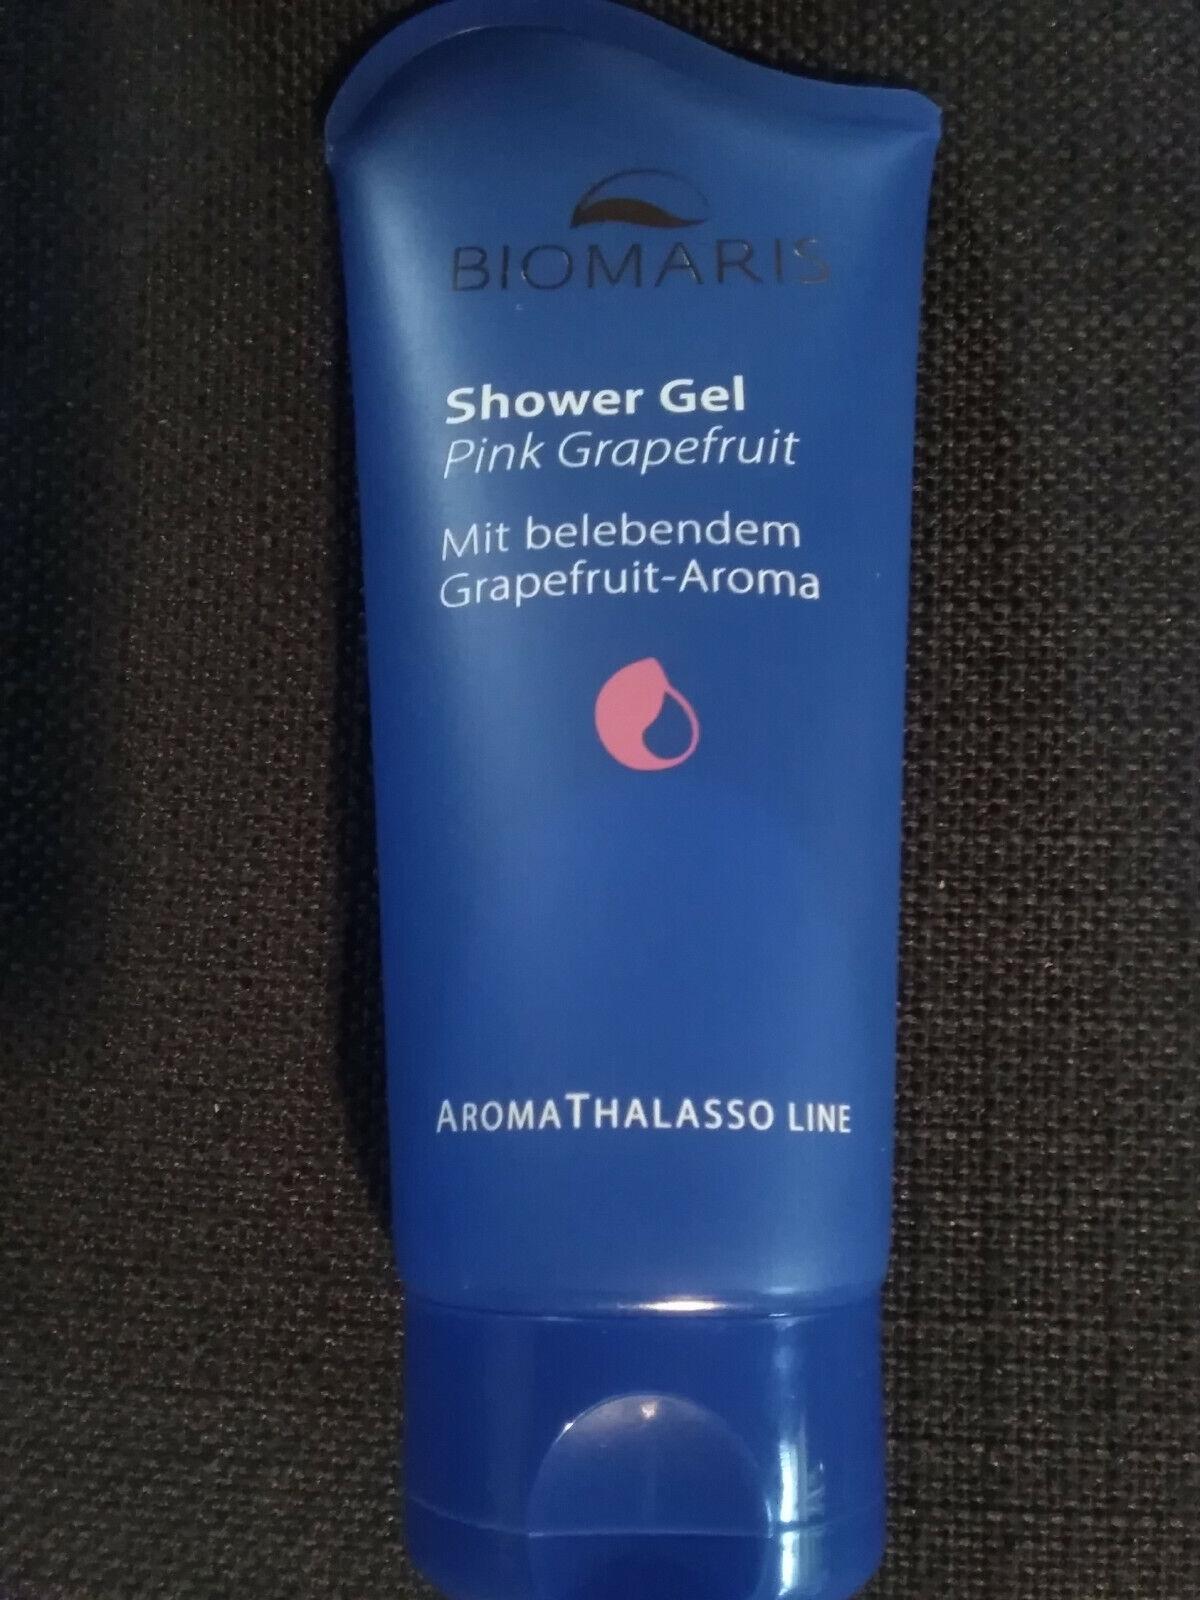 Biomaris Shower Gel, Duschgel, Aroma Thalasso Line, Pink Grapefruit, 200 ml